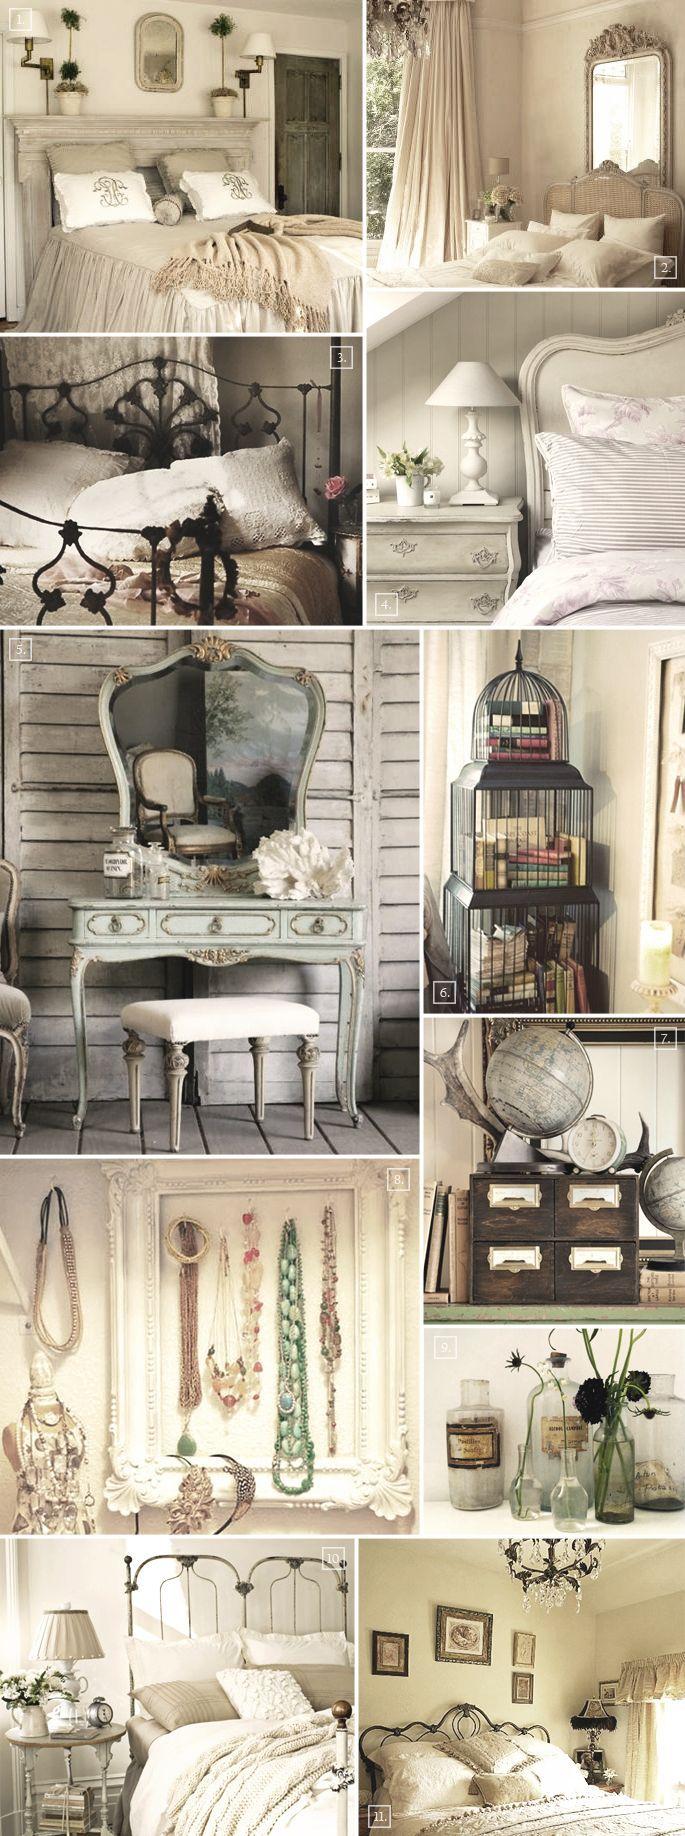 Vintage Bedroom Decor Accessories And Ideas